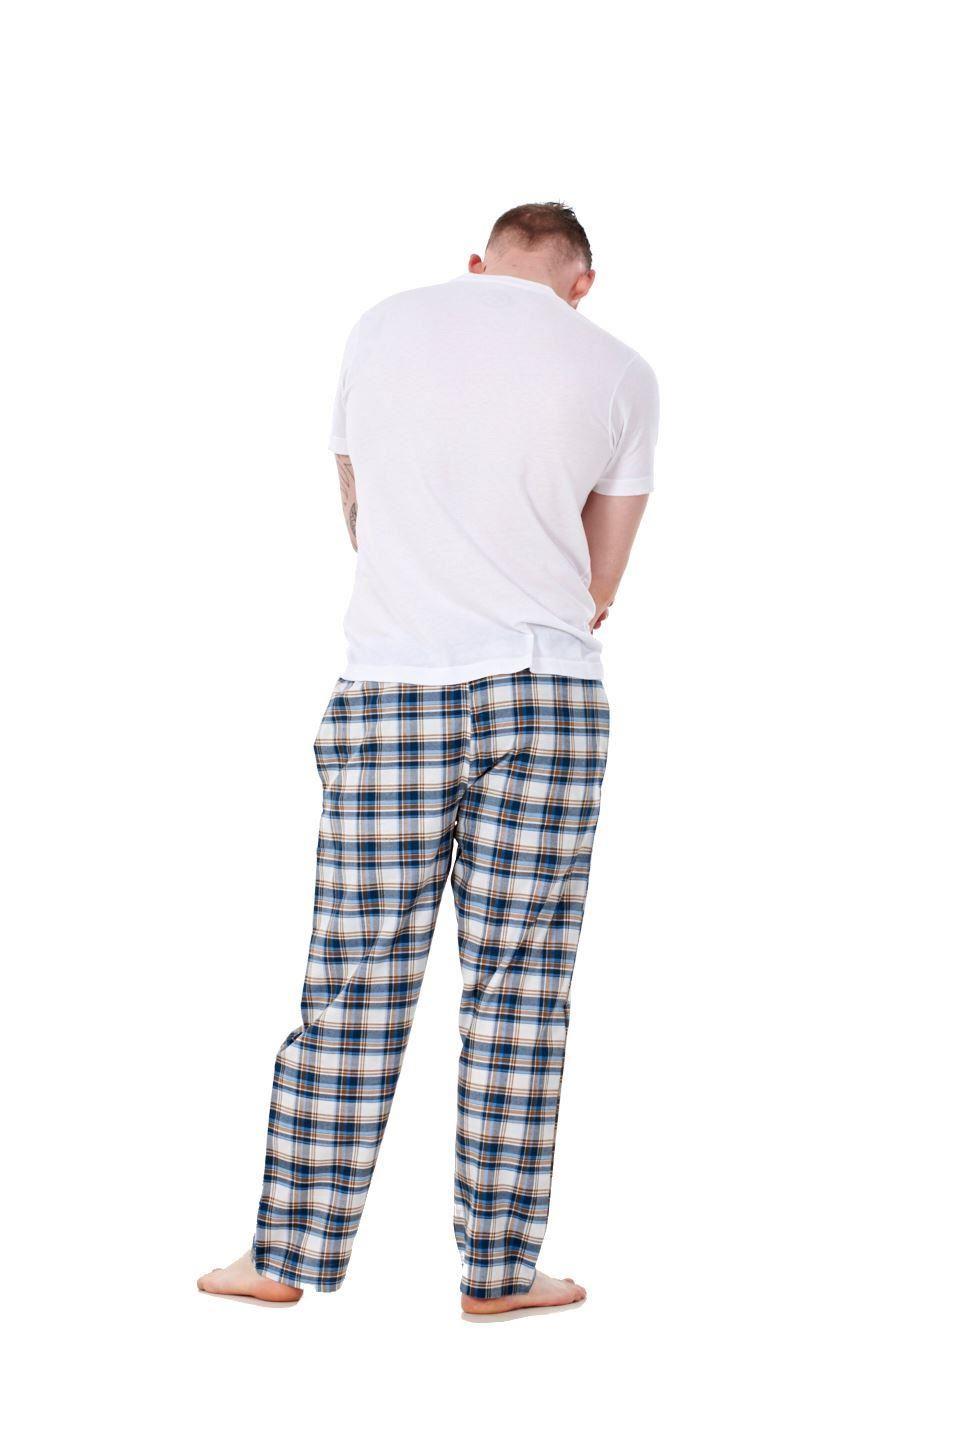 Mens-Pyjama-Bottoms-Rich-Cotton-Woven-Check-Lounge-Pant-Nightwear-Big-3XL-to-5XL Indexbild 26